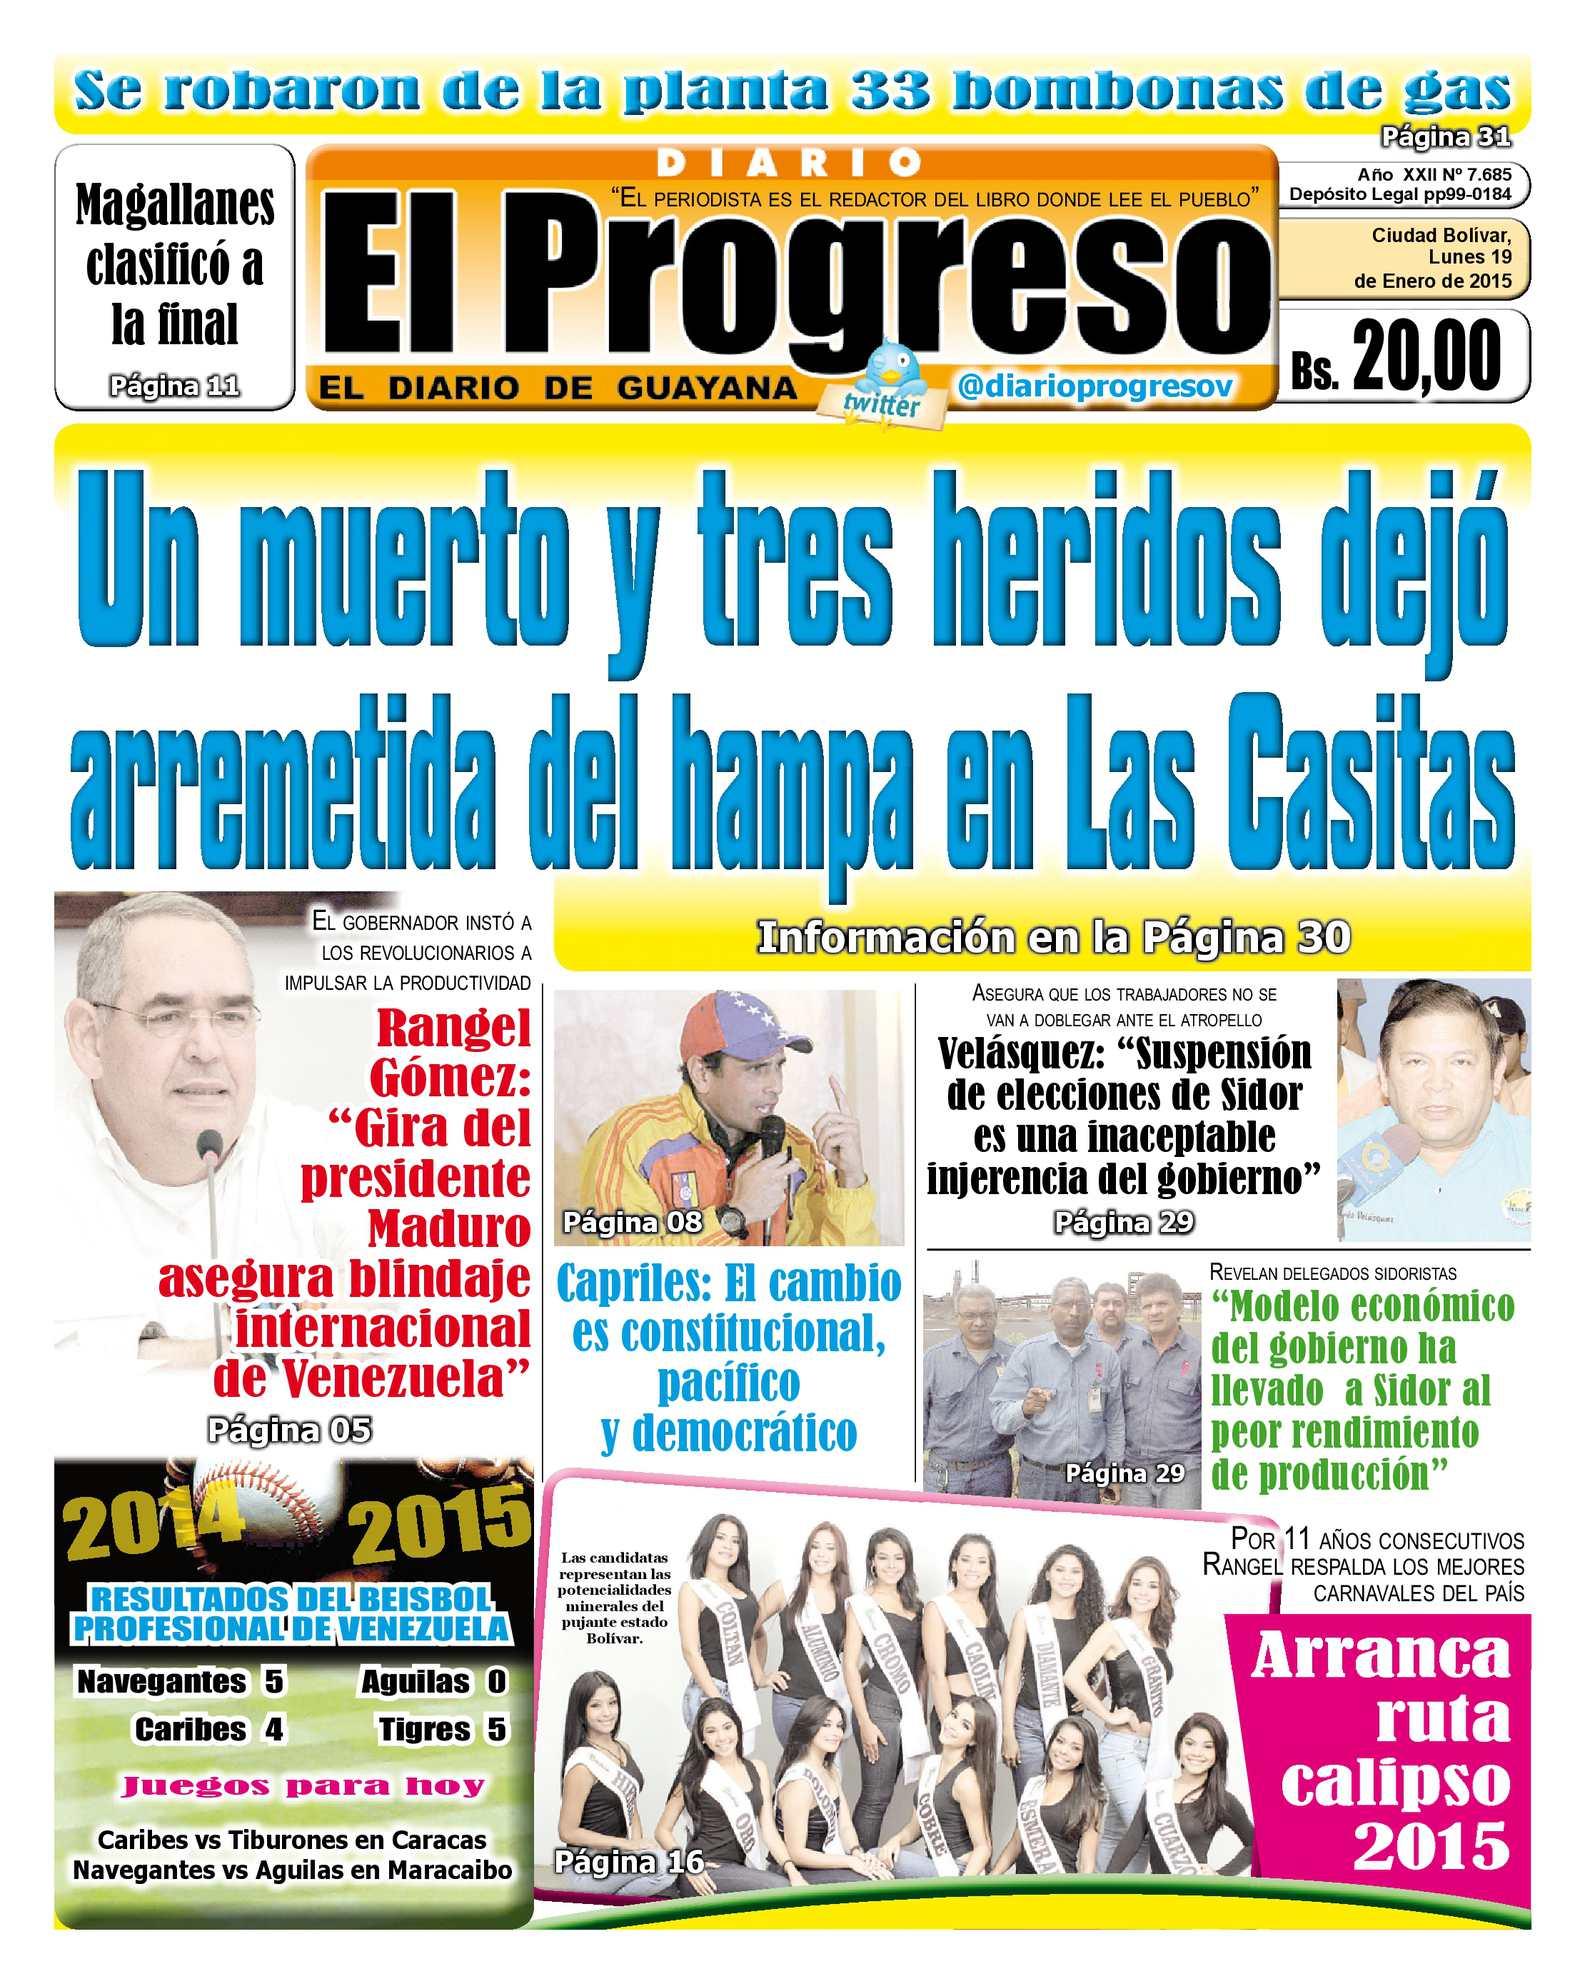 PROSTITUTAS GUIPUZCOA QUE PIDEN LOS HOMBRES A LAS PROSTITUTAS